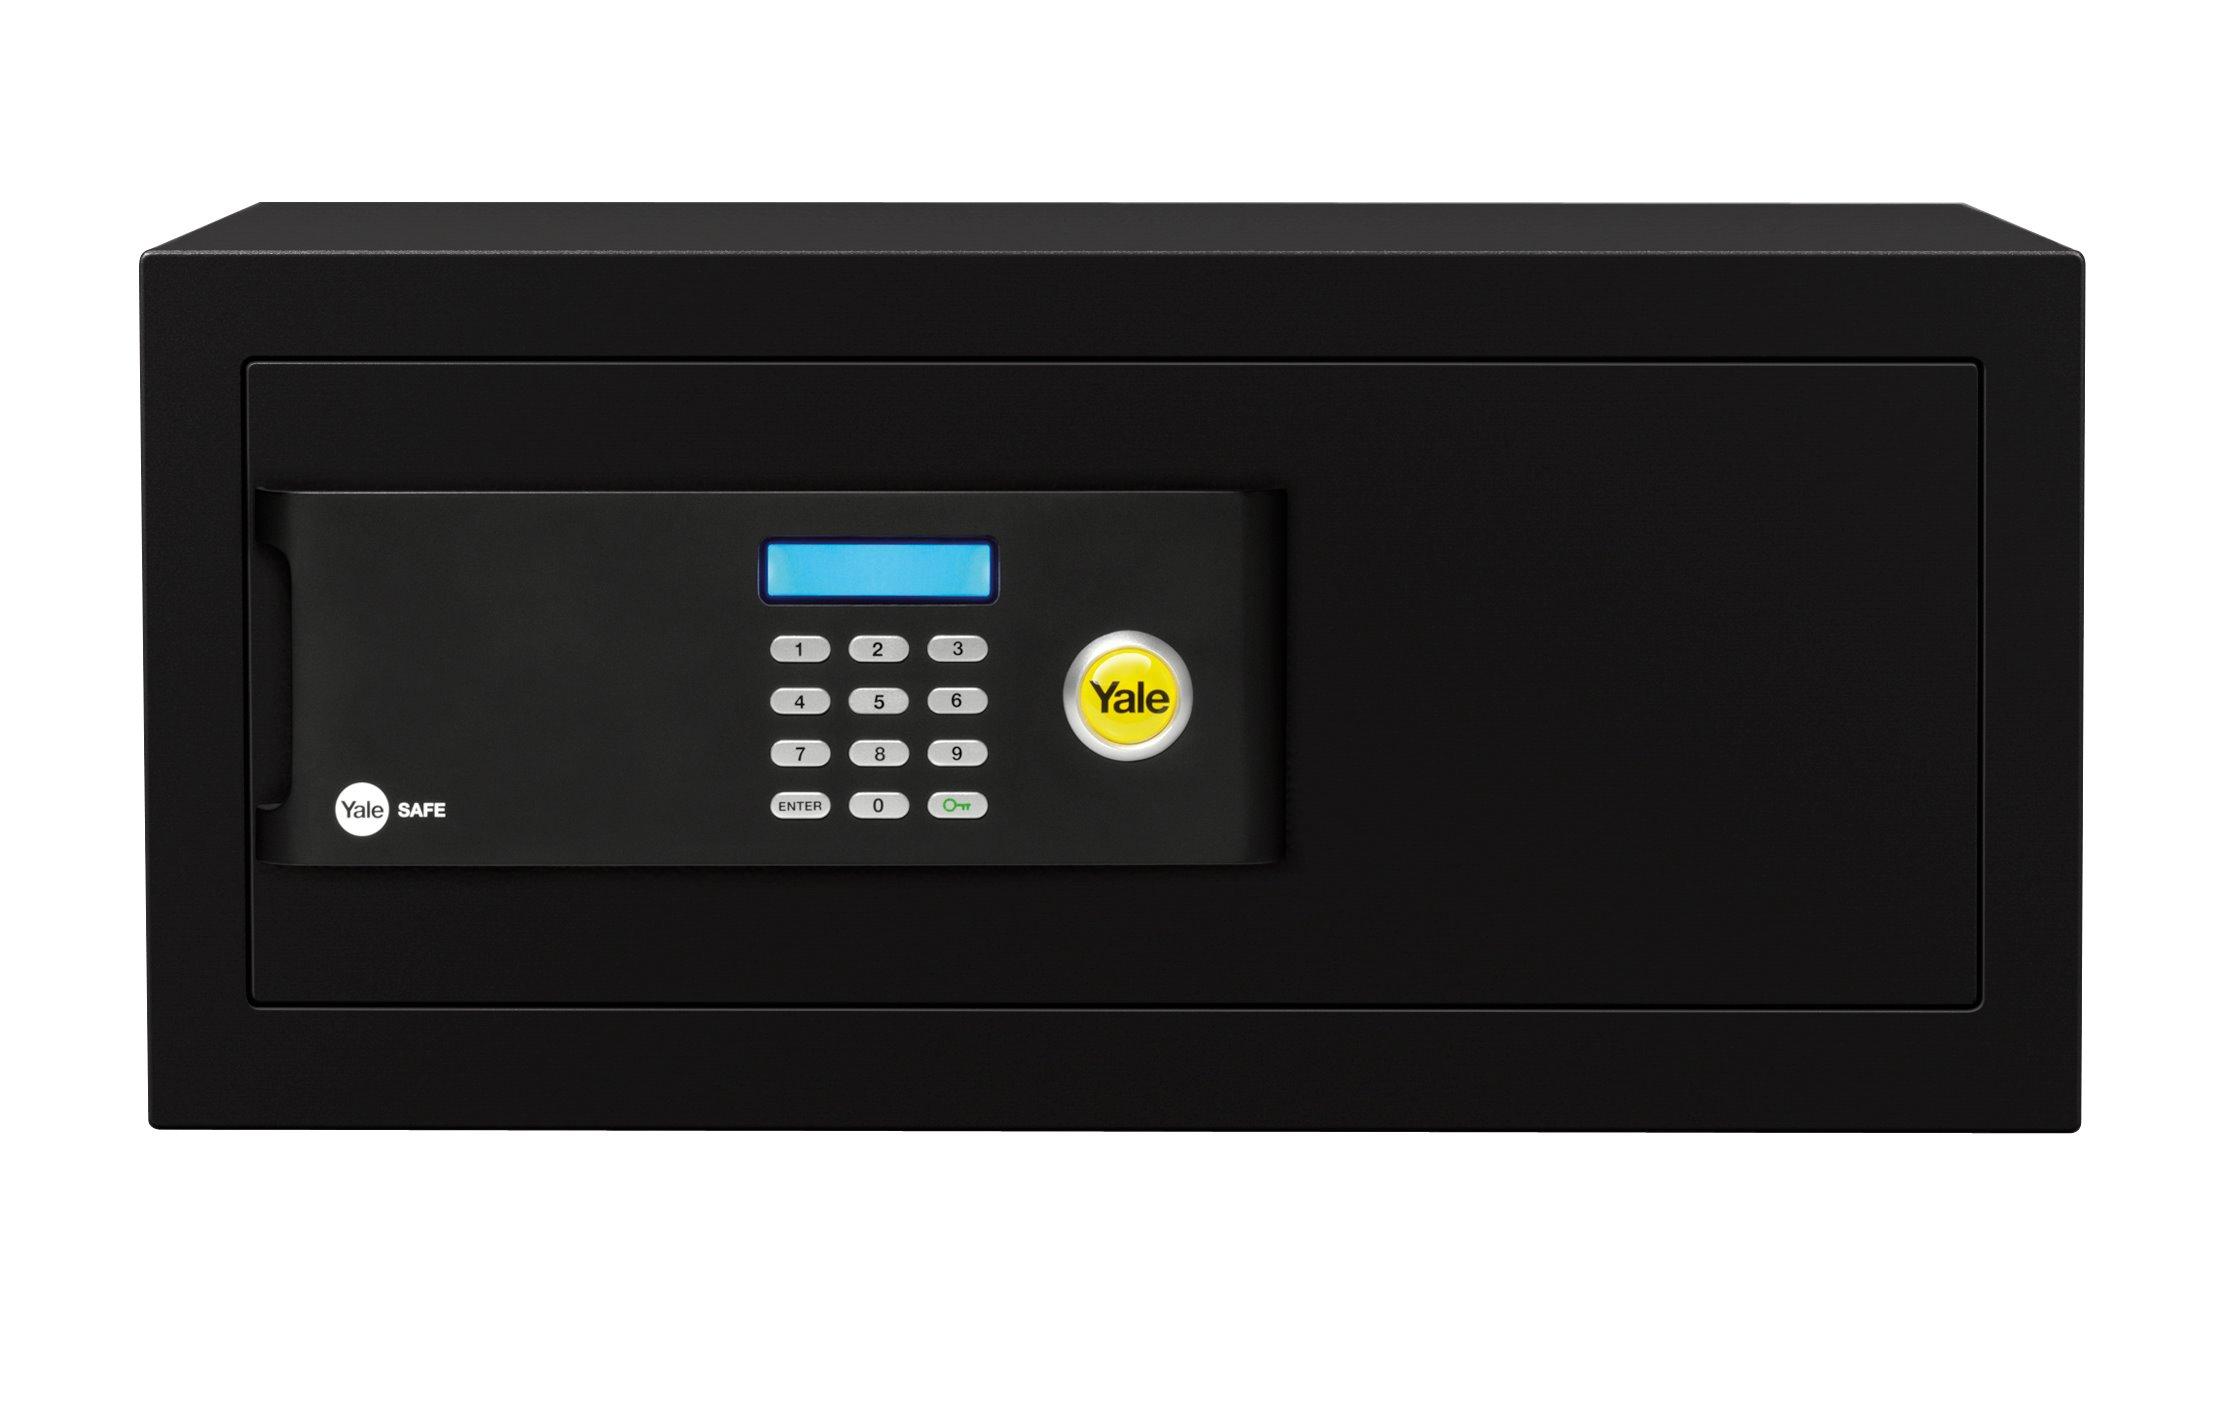 Ylb 200 Eb1 Laptop Safe Security Safes Smart Locks